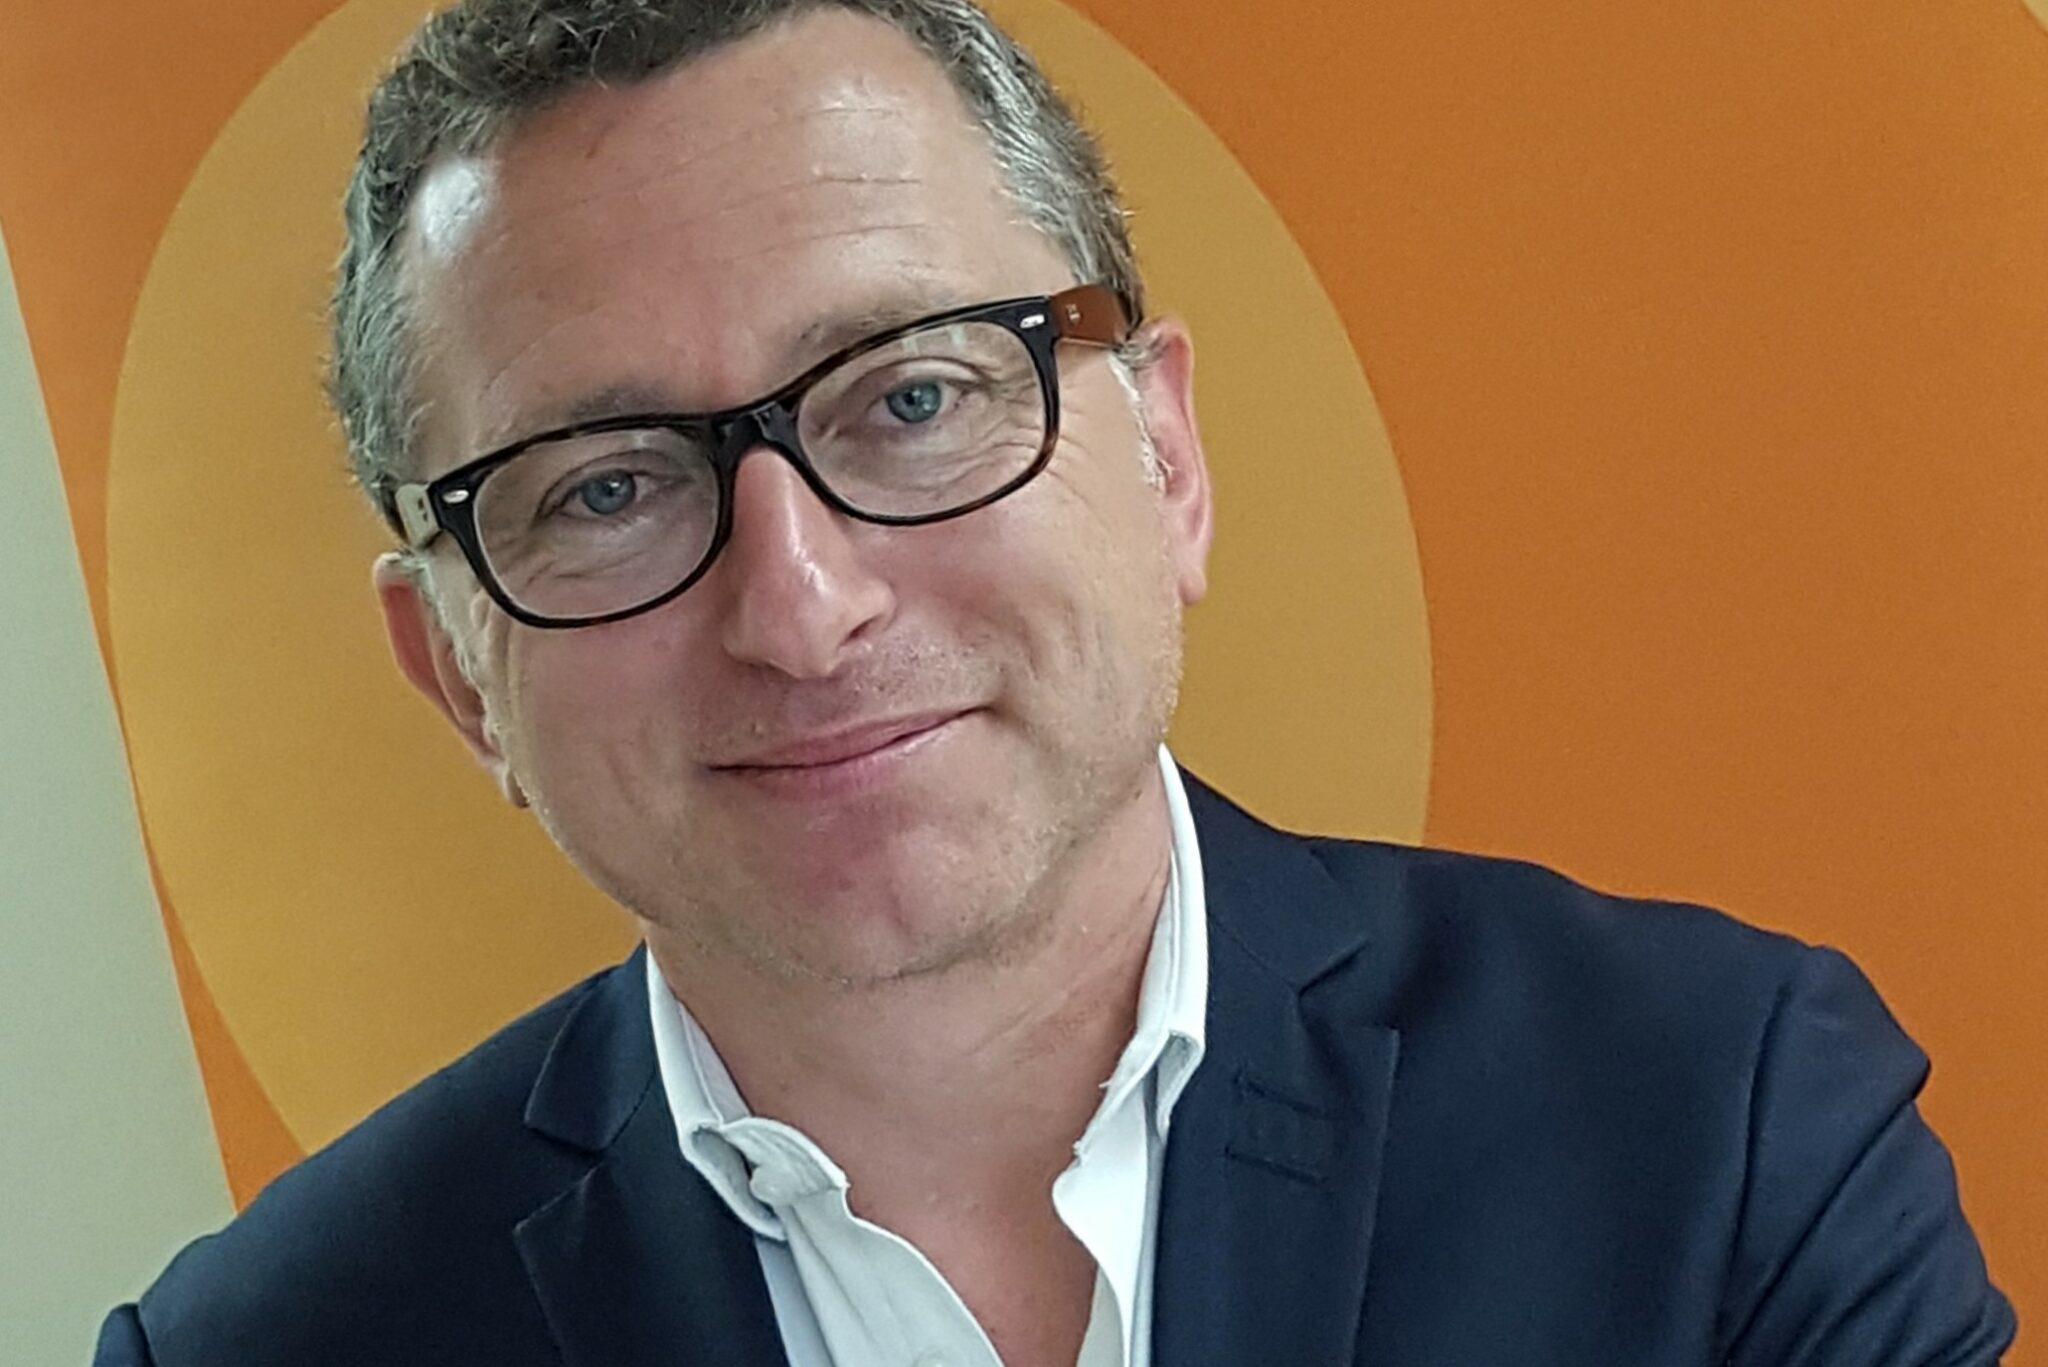 Entrevista DA Retail con Alvaro Otal, gerente de Anceco